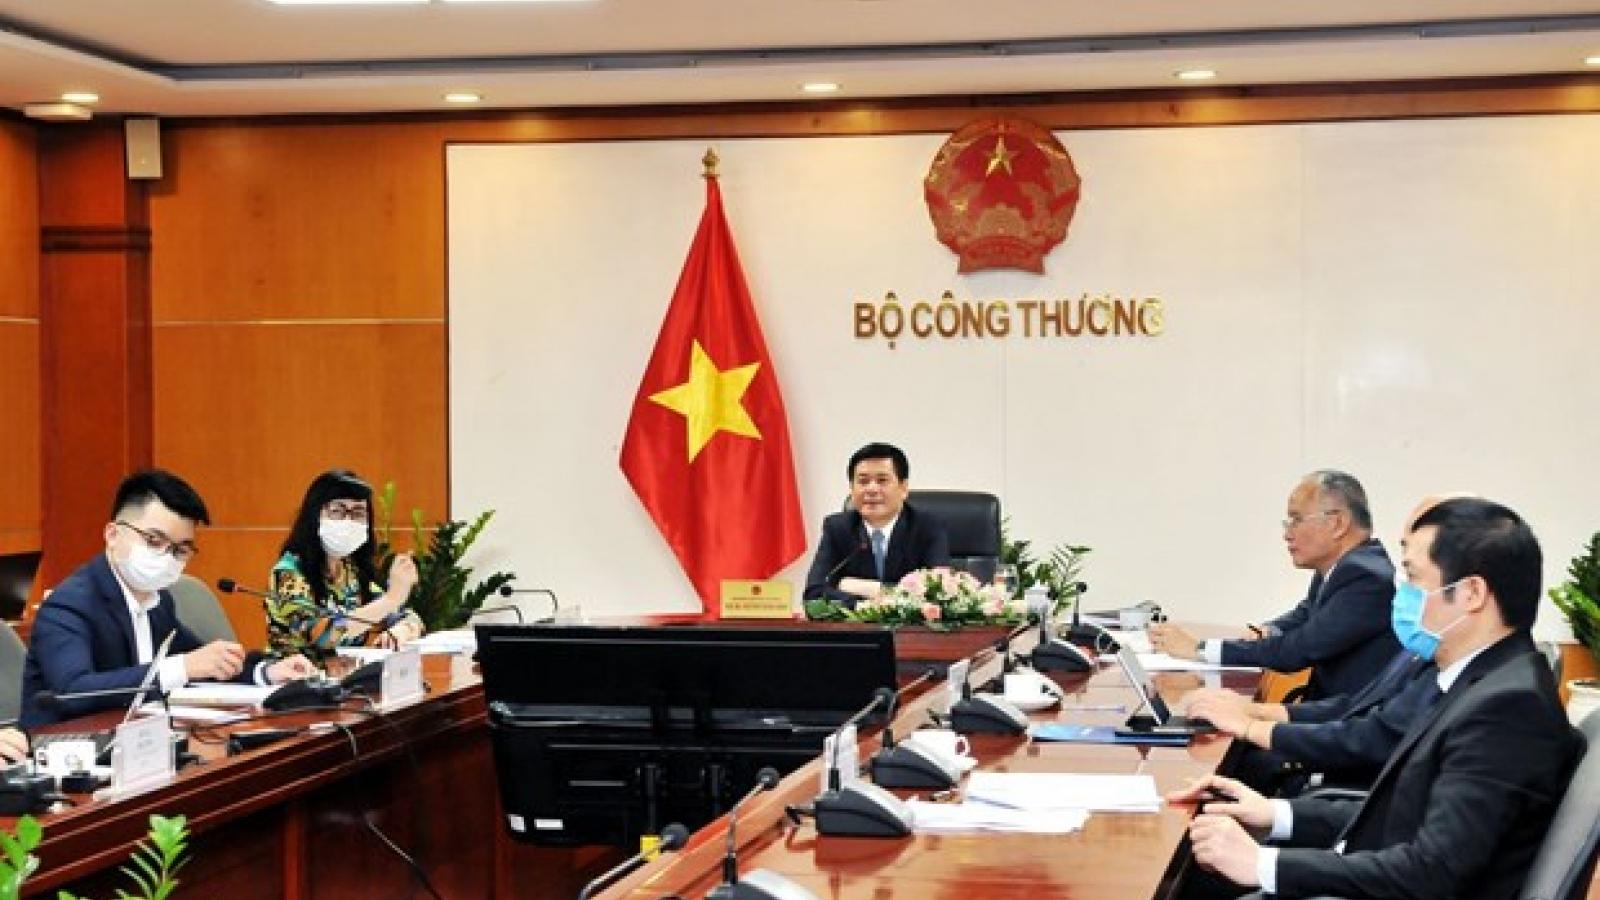 Vietnam asks China's Guangxi to facilitate cross-border trade